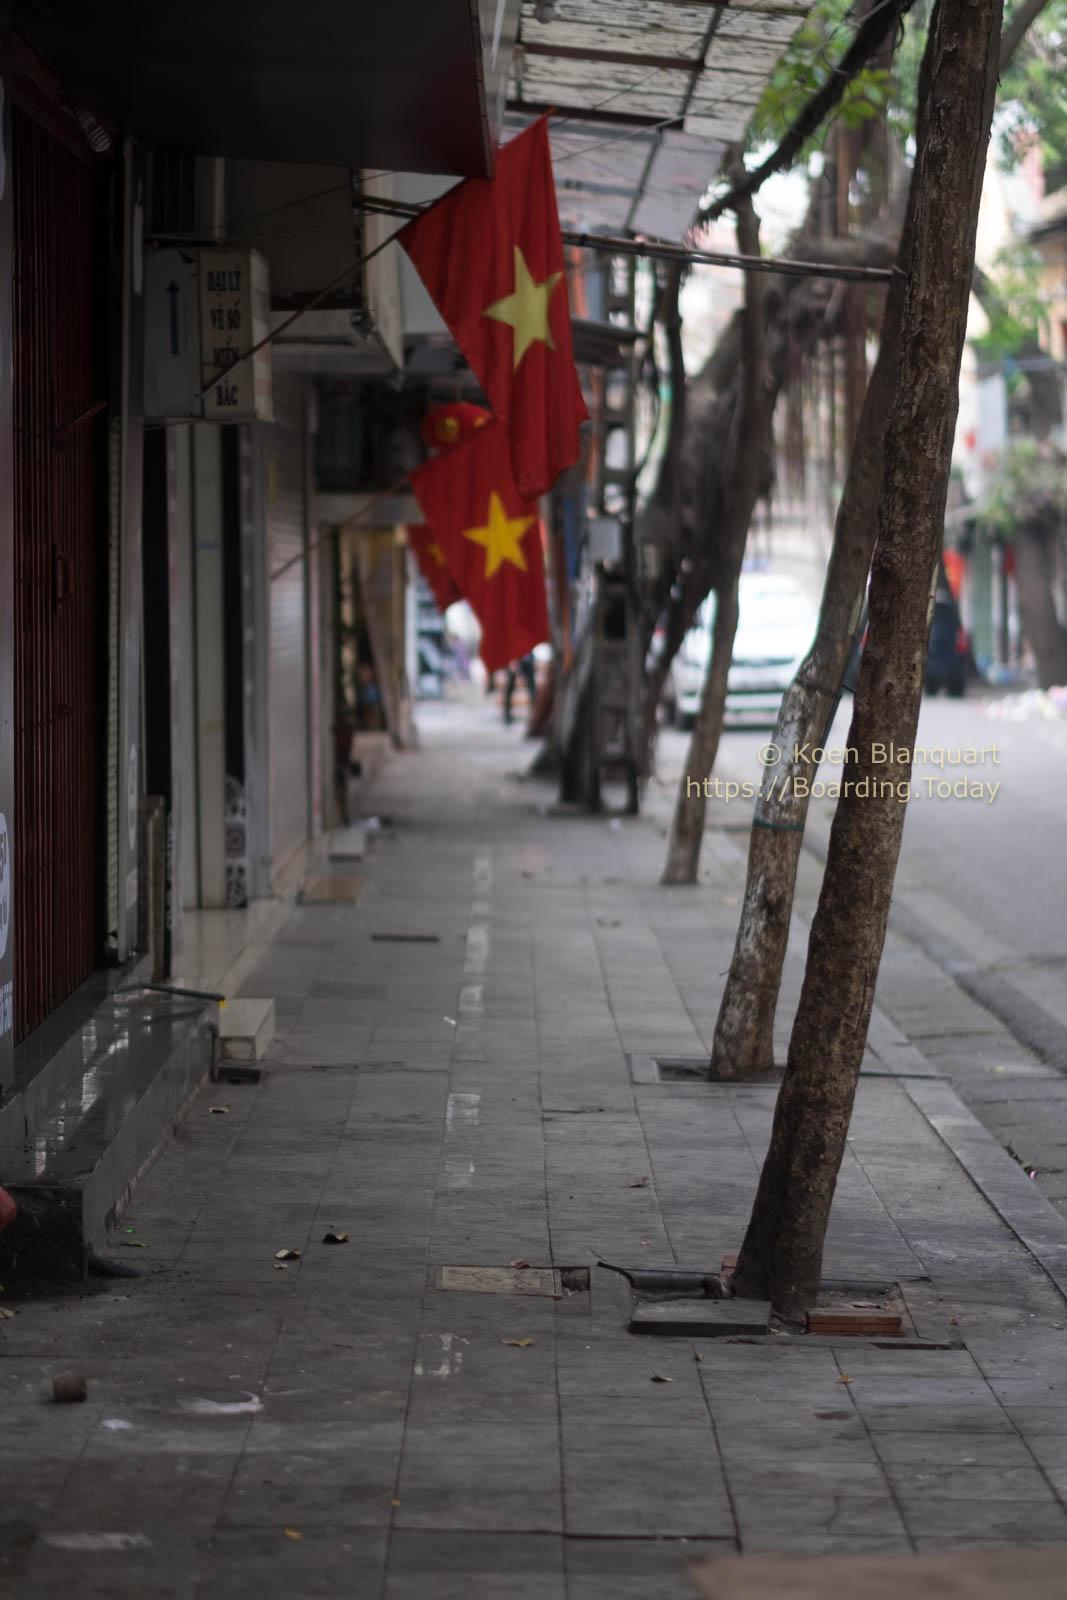 20170129-DSCF6492Hanoi, Vietnam by Koen Blanquart for Boarding.Today.jpg